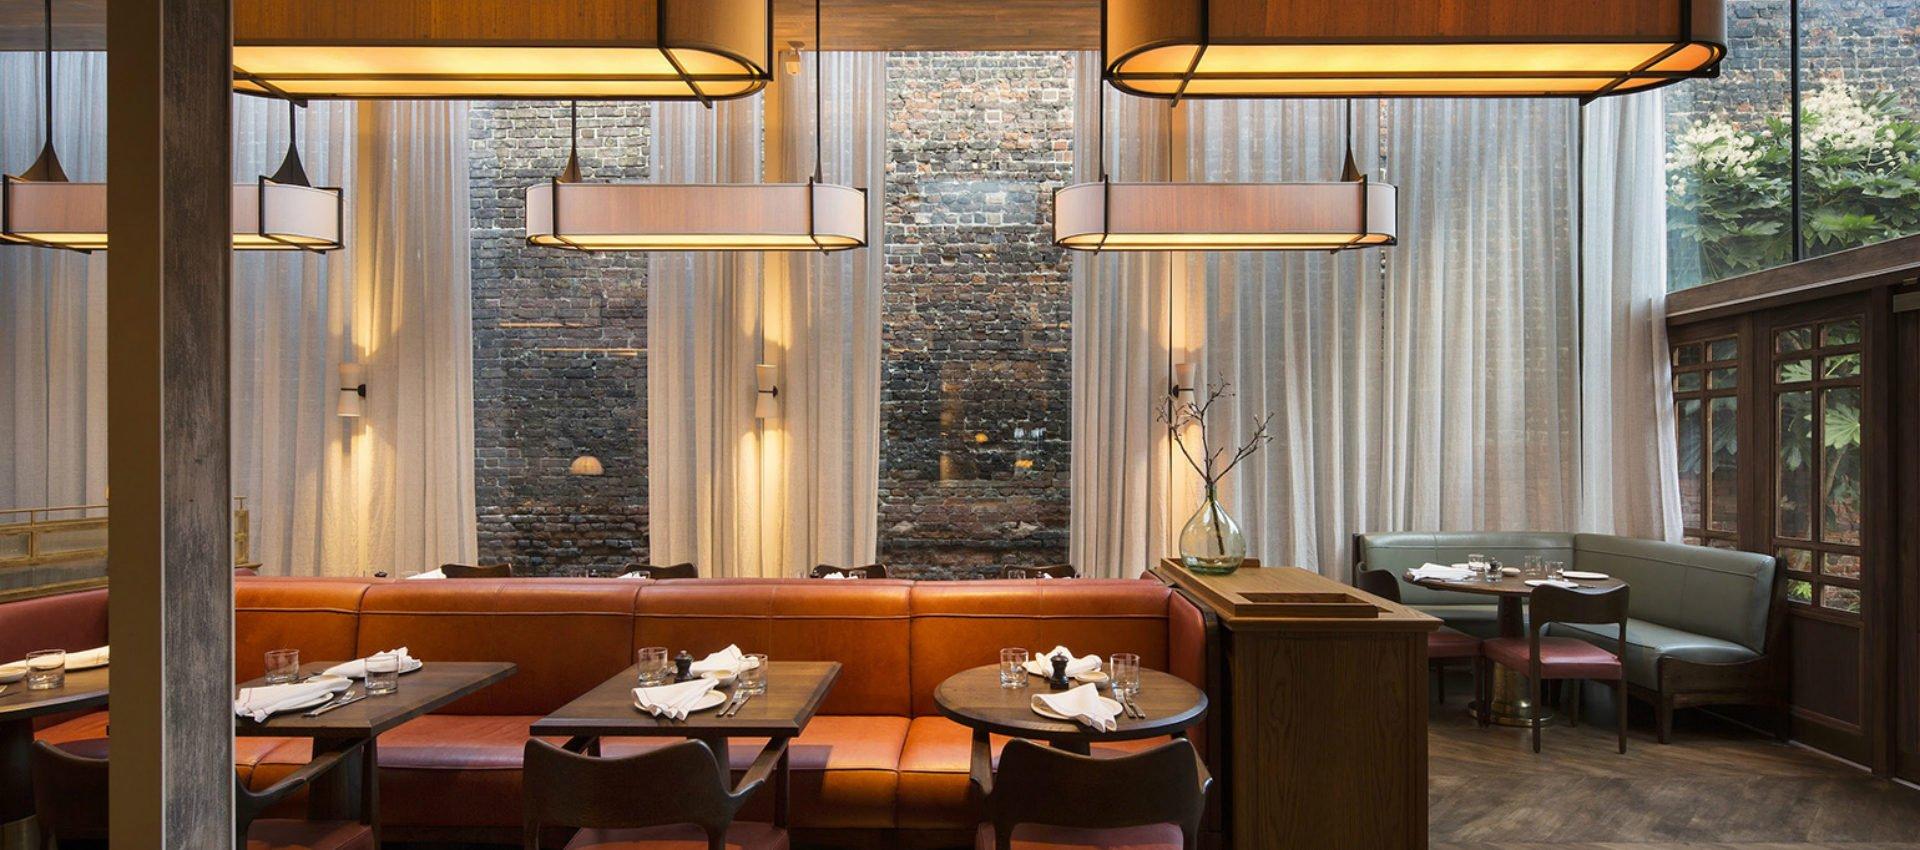 Luca Italian Cuisine With A British Twist In Clerkenwell